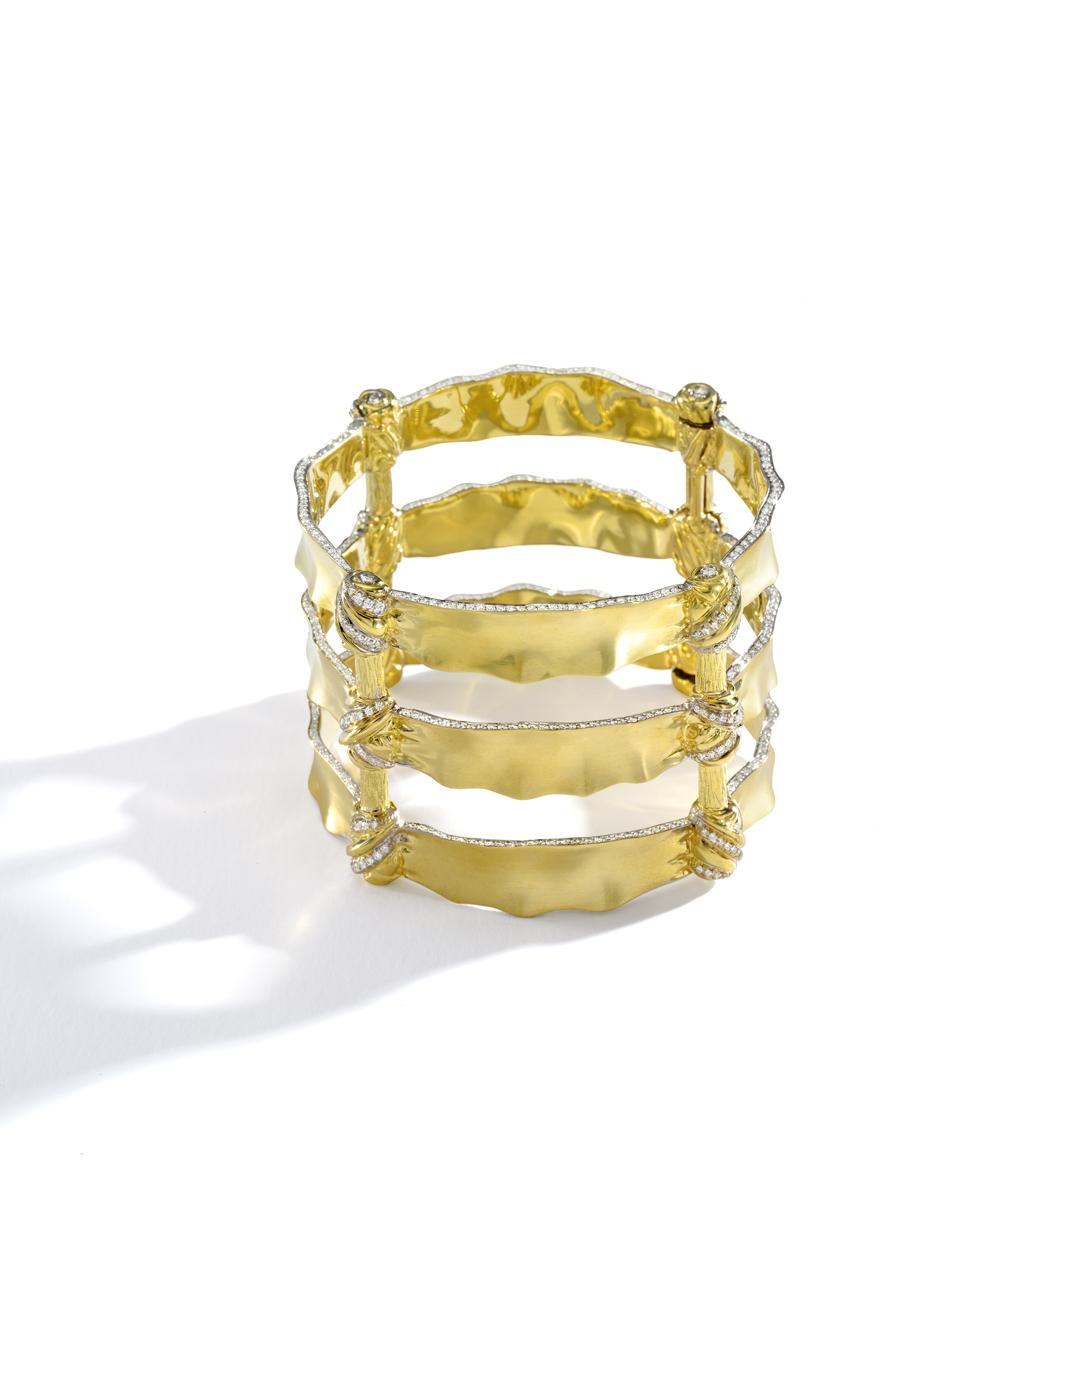 mish_jewelry_product_Bond-Bow-Cuff-1